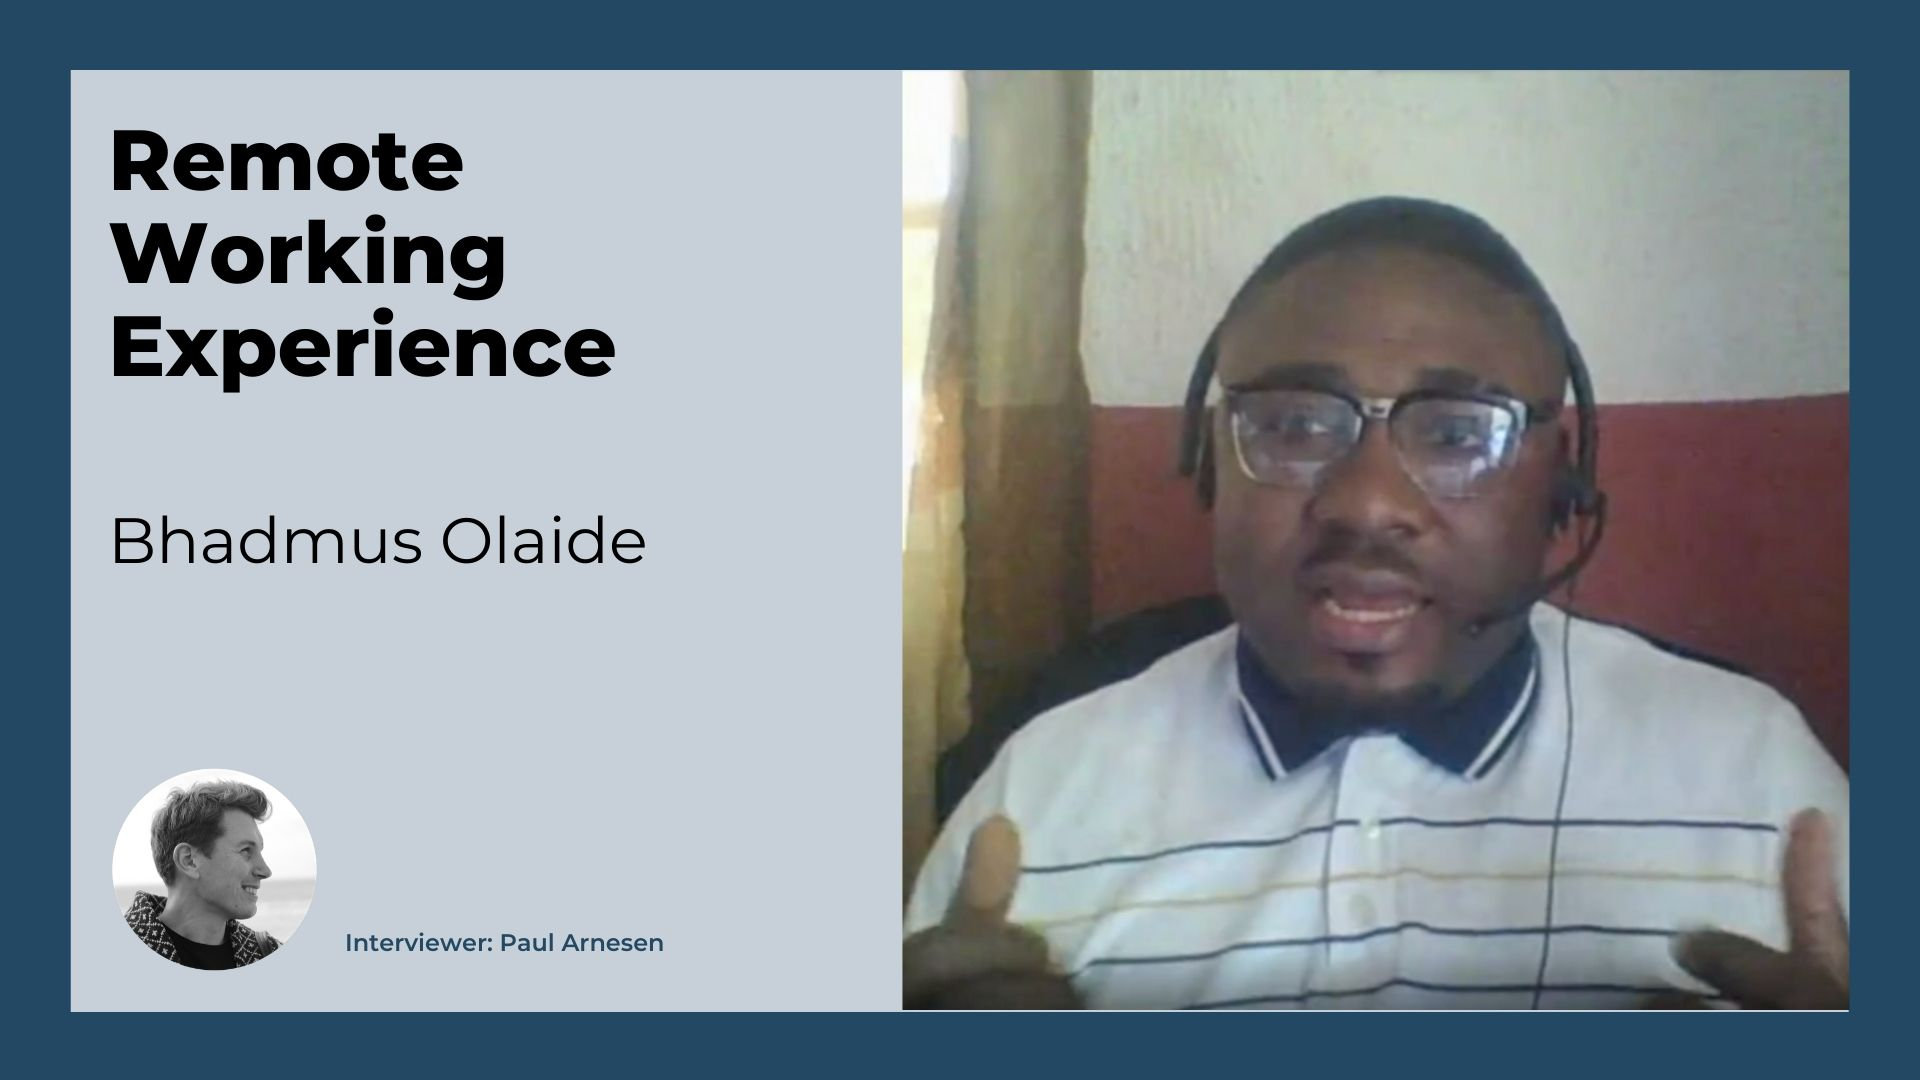 Bhadmus Olaide